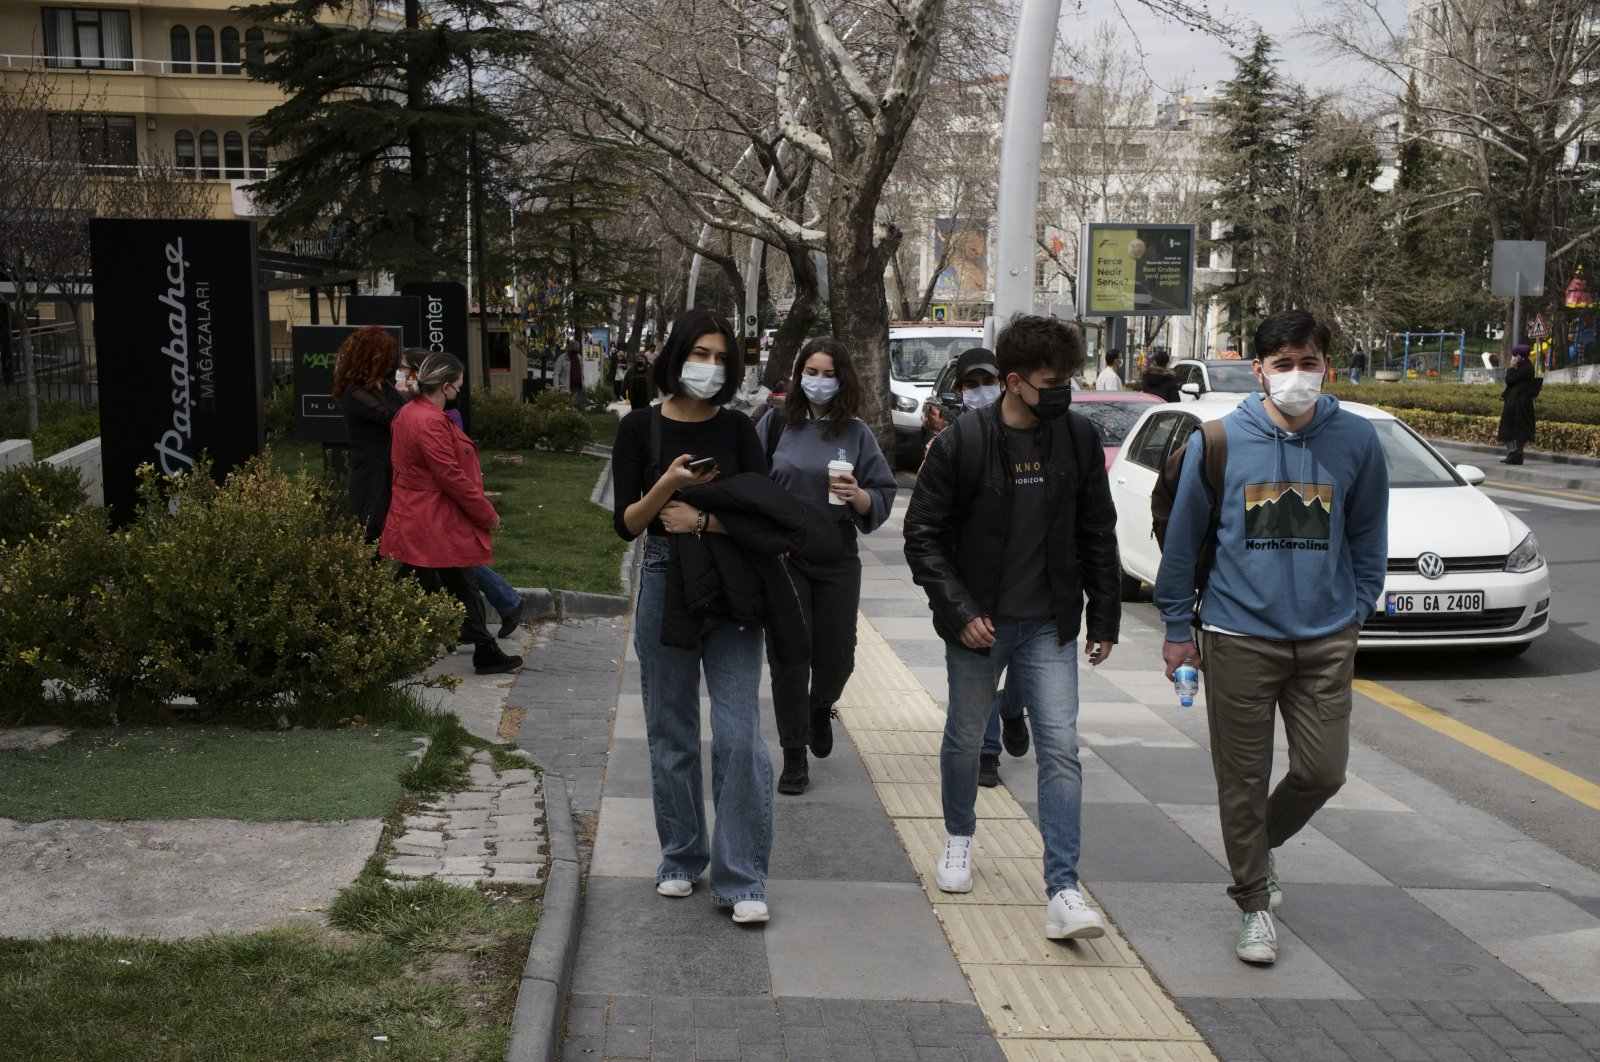 People wearing protective masks walk on a street in the capital Ankara, Turkey, April 16, 2021. (AP PHOTO)